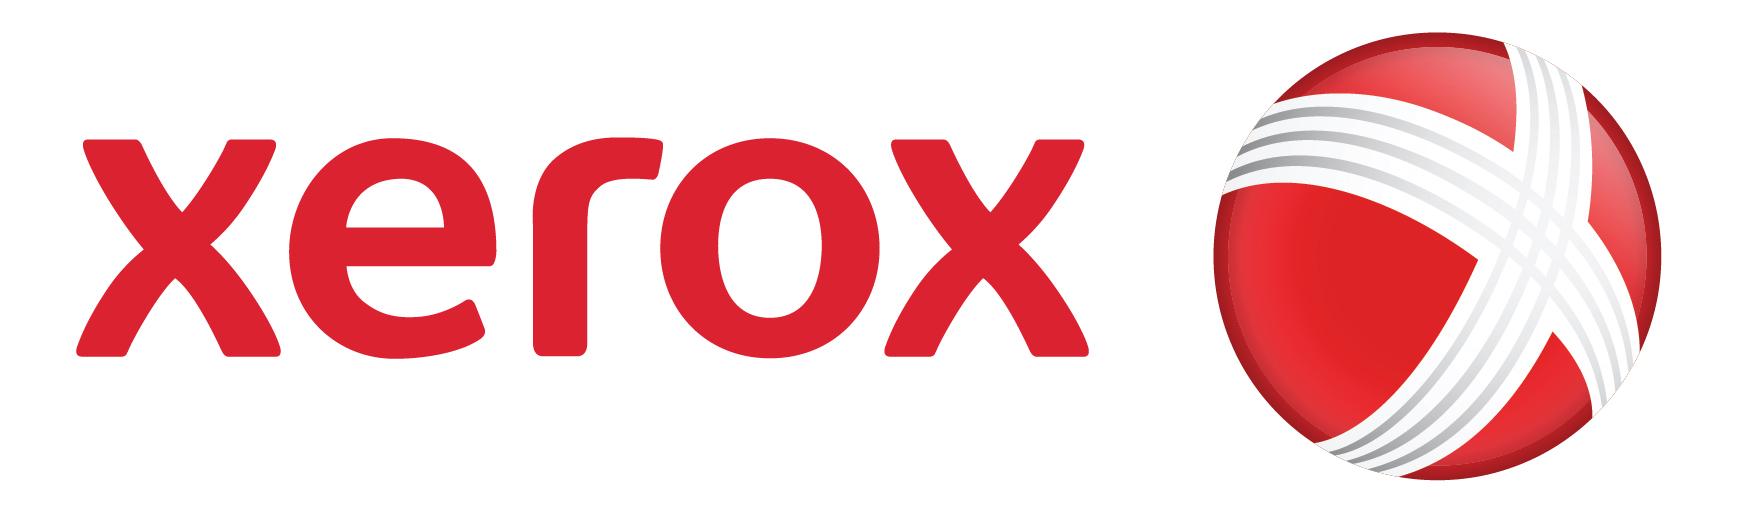 xerox printers logo